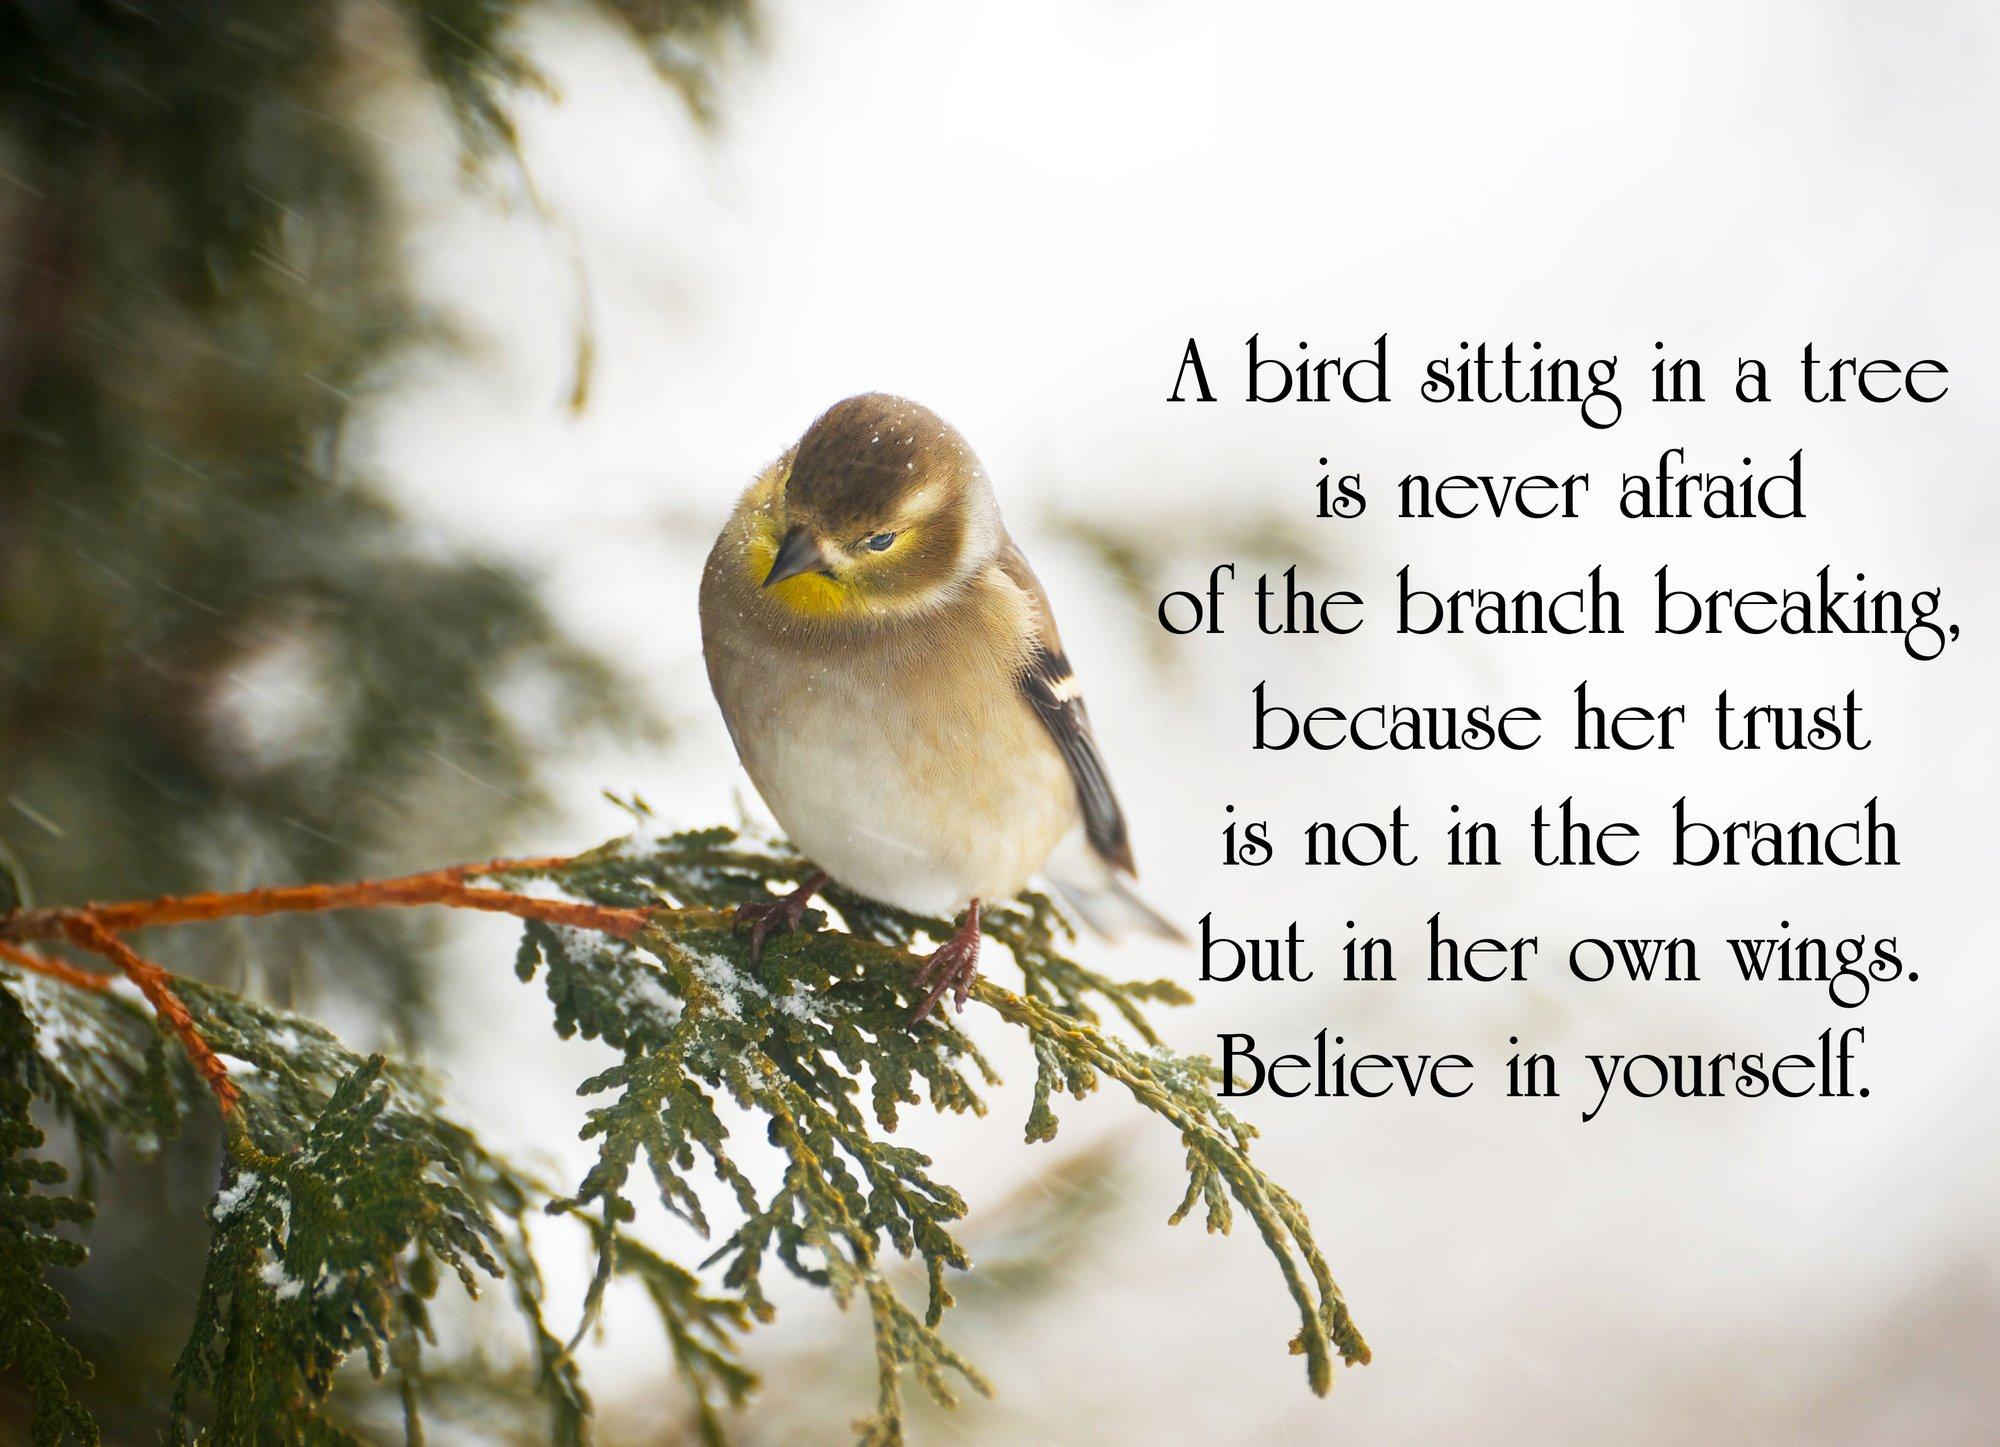 A bird sitting in a tree - Believe in Yourself